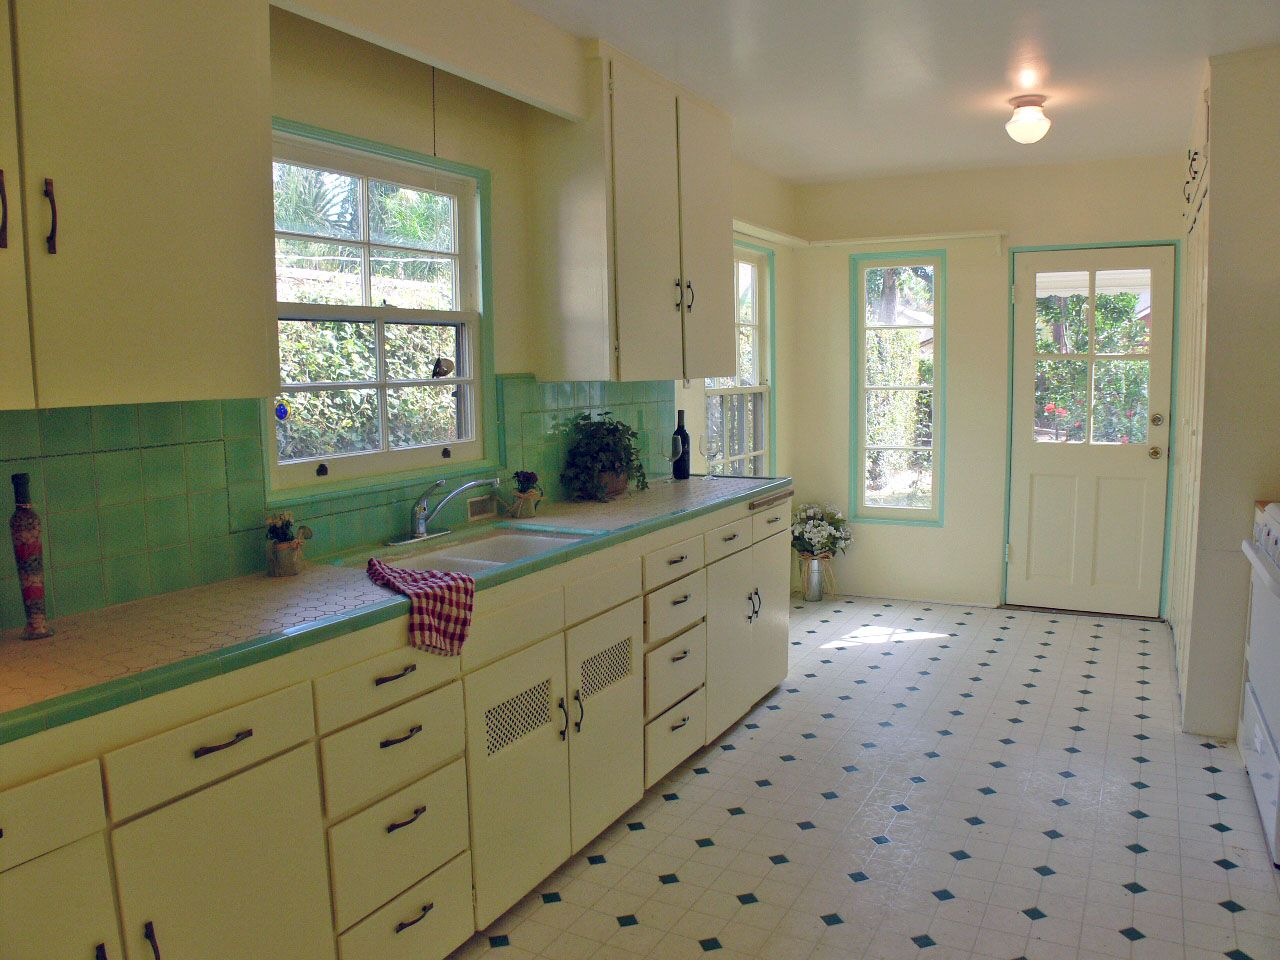 tile kitchen countertops Darling kitchen with original honeycomb tile countertops